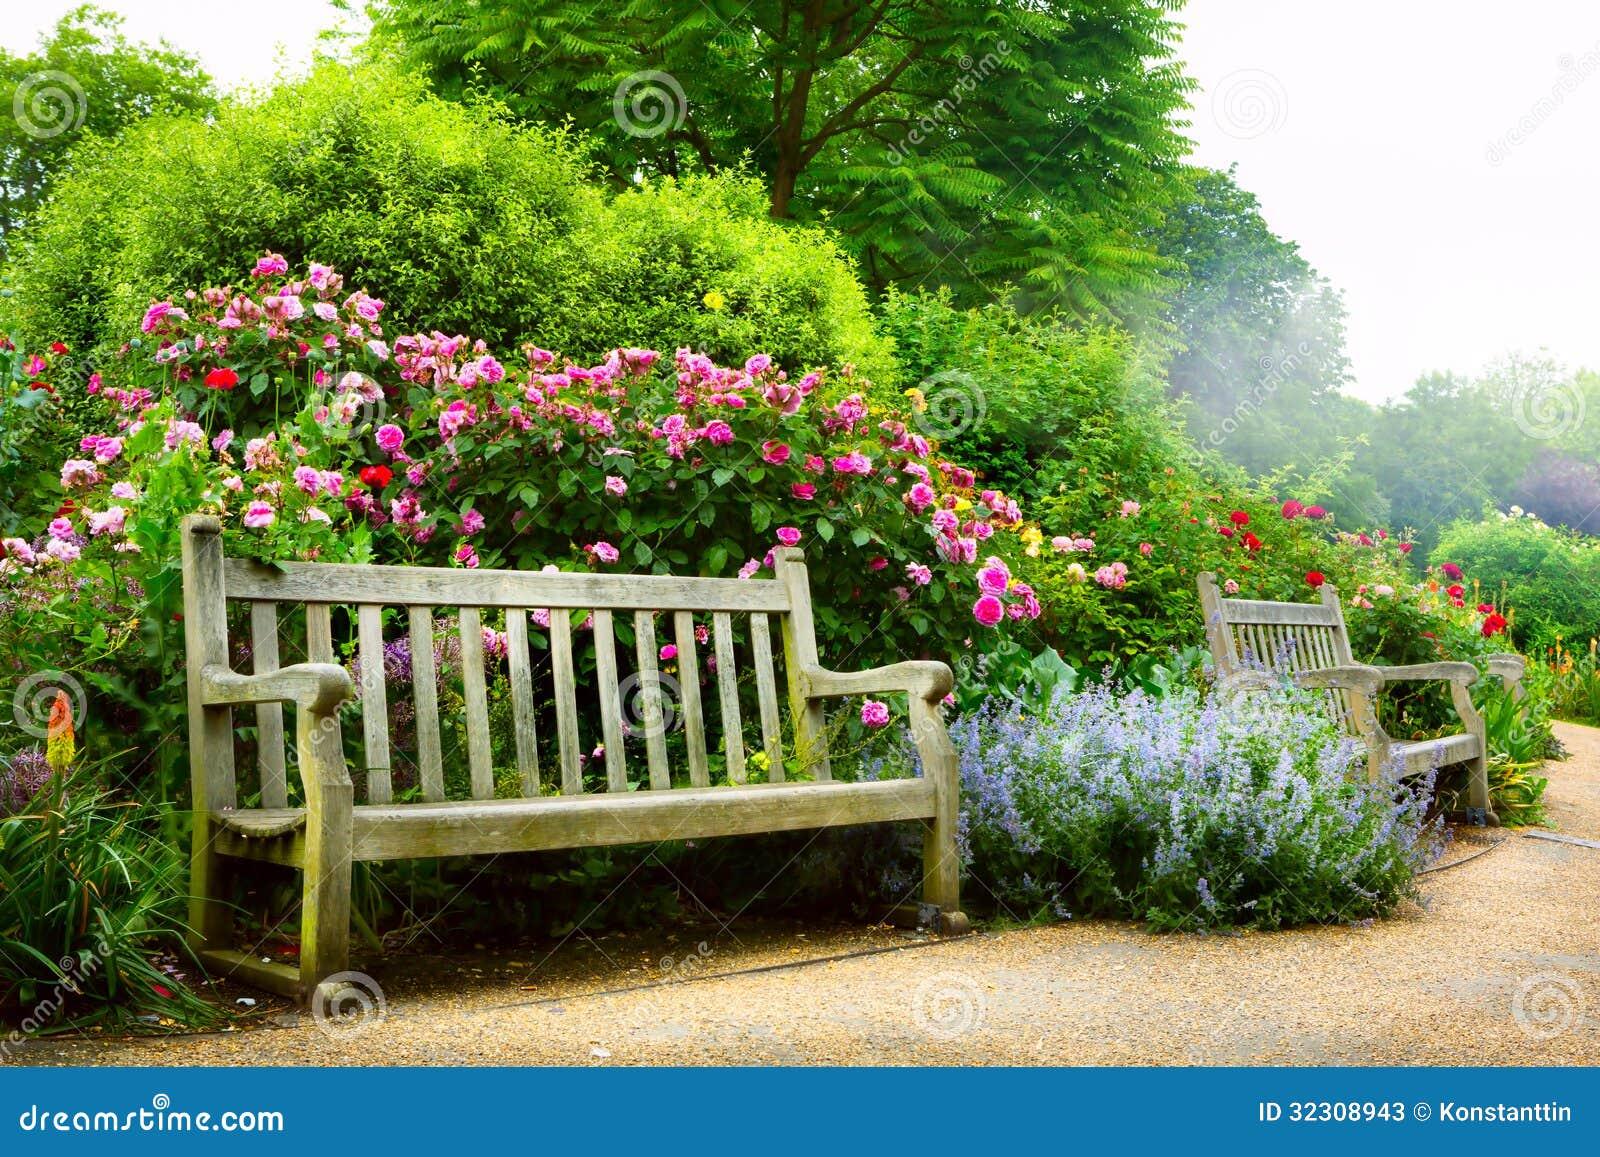 Banco e fiori di arte di mattina in un parco inglese